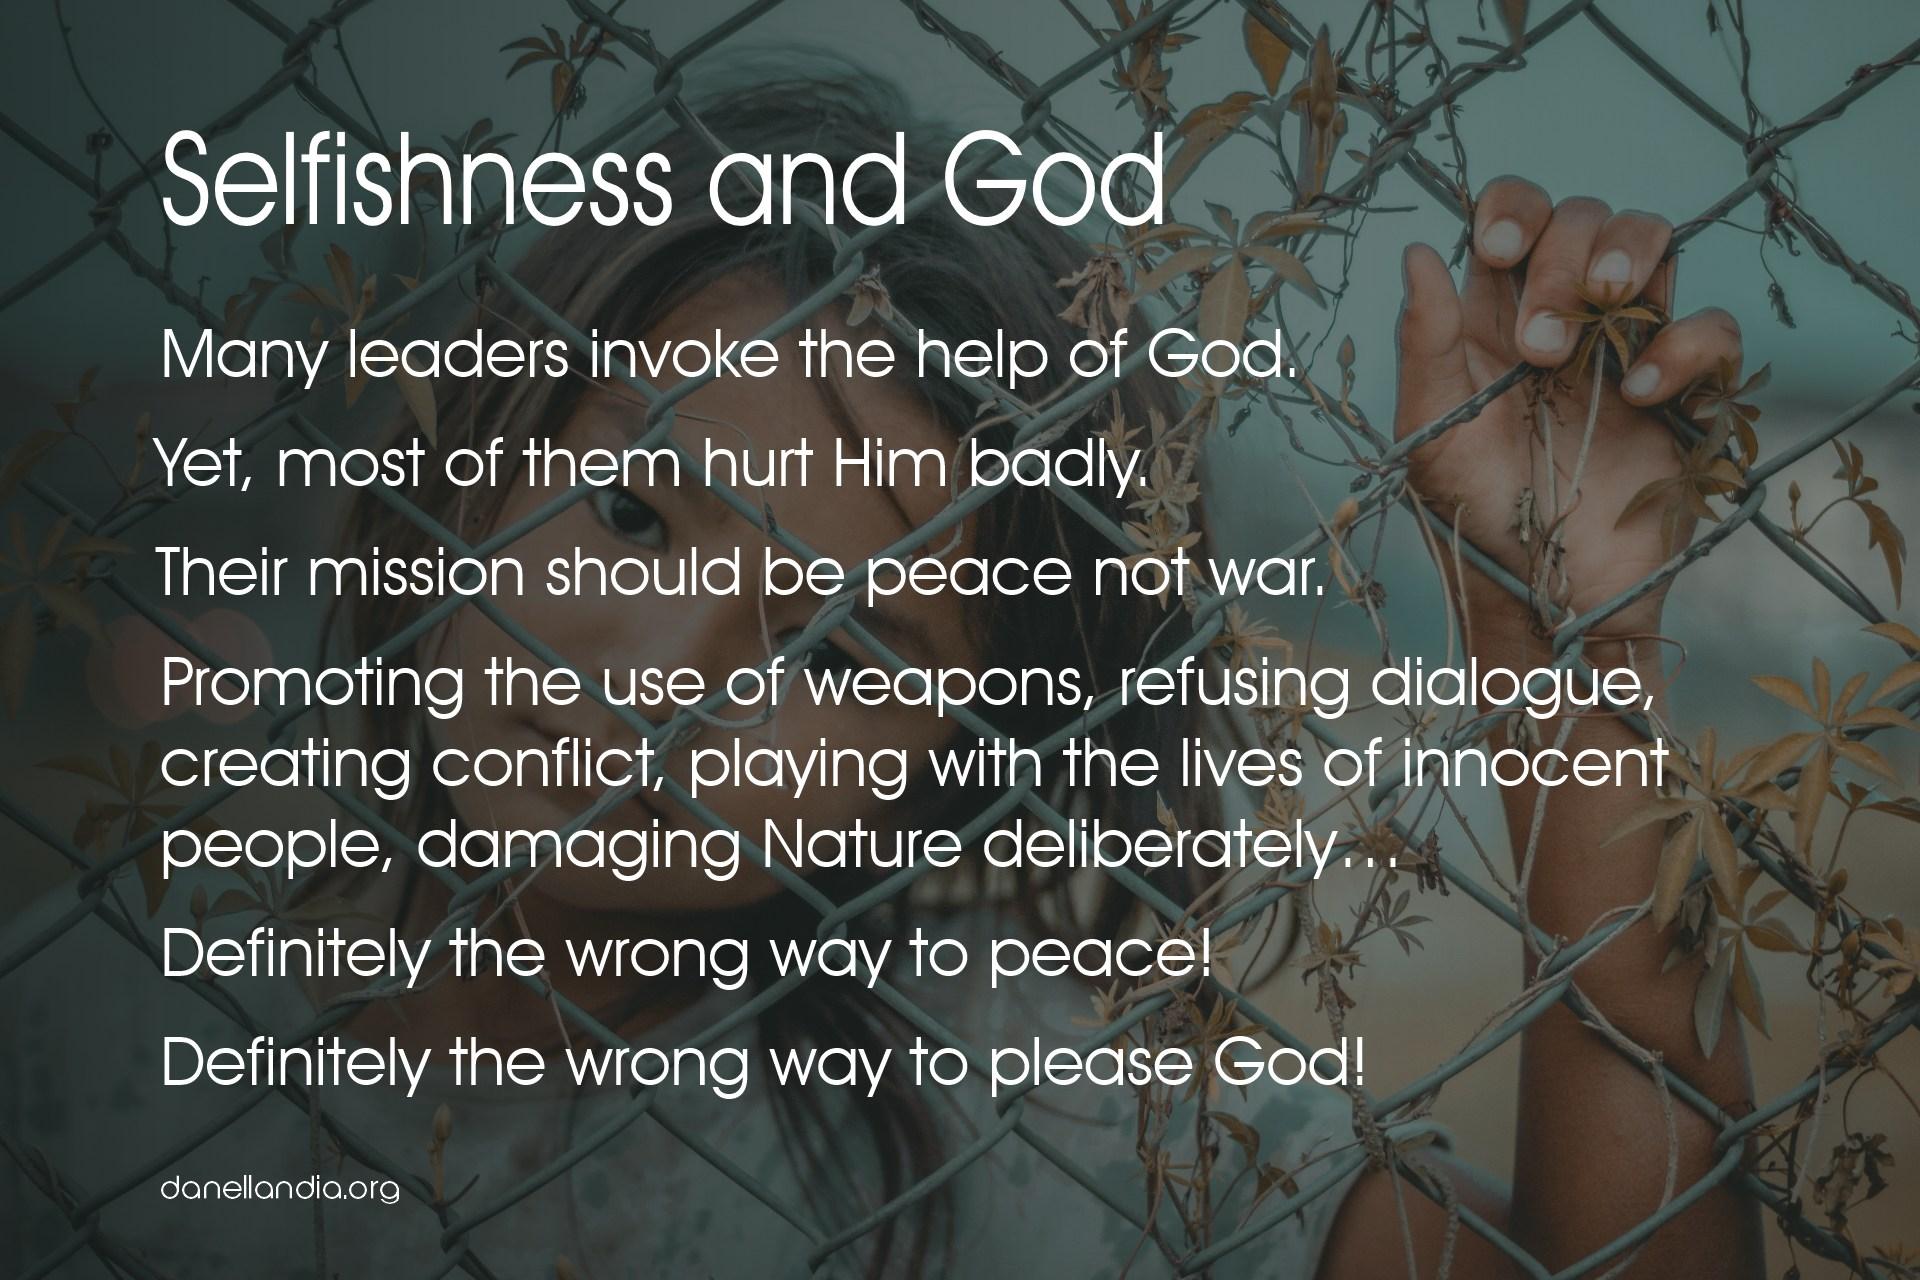 Selfishness and God